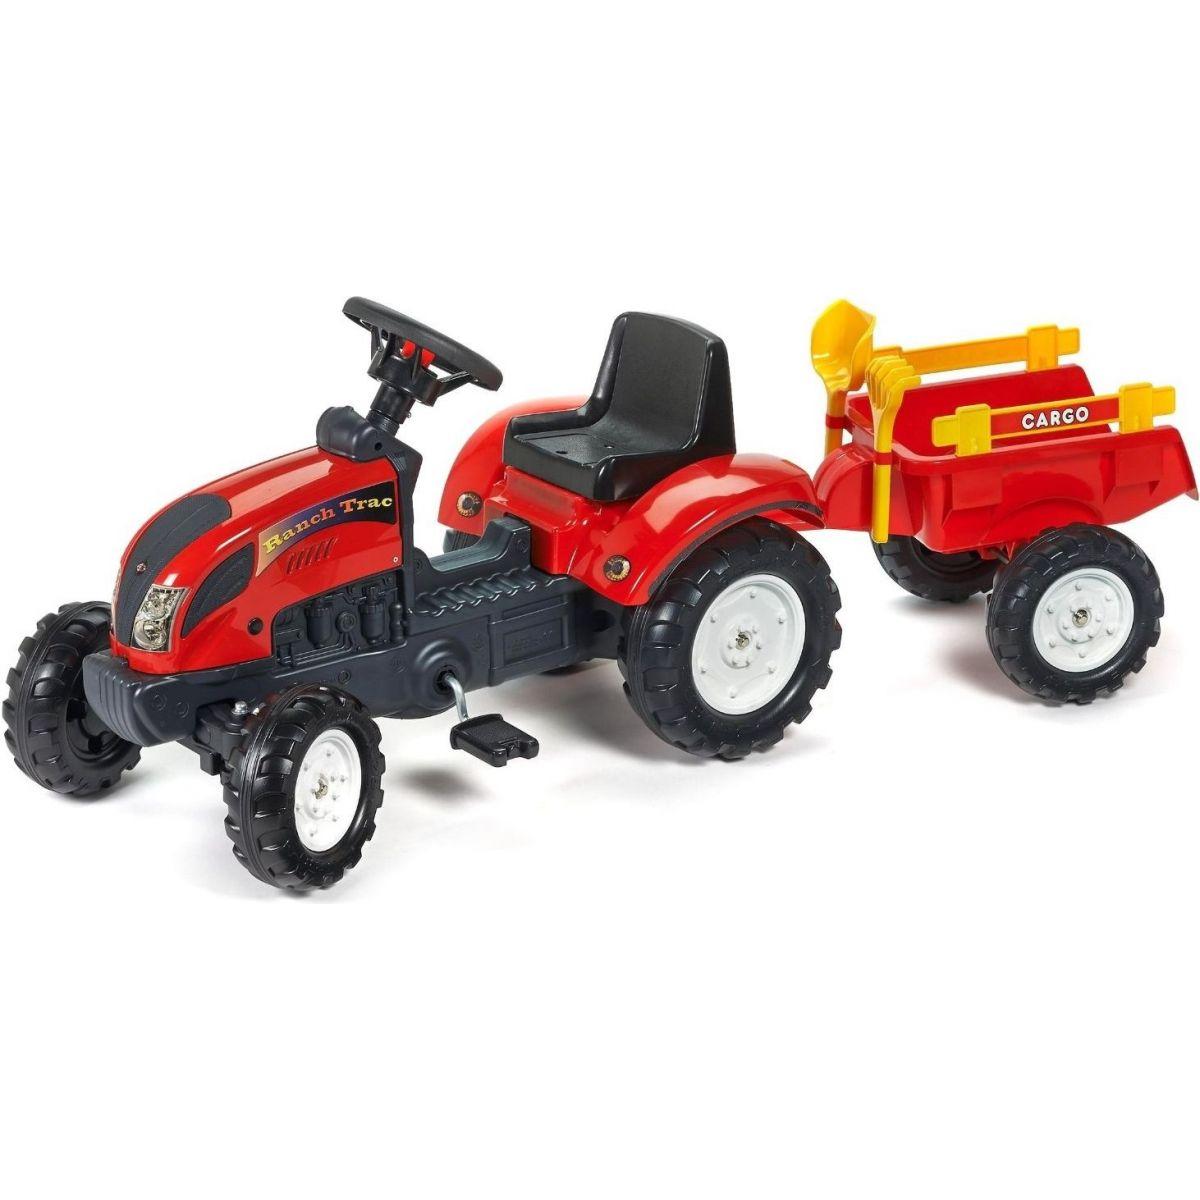 Falk Šlapací traktor Ranch Trac s valníkem